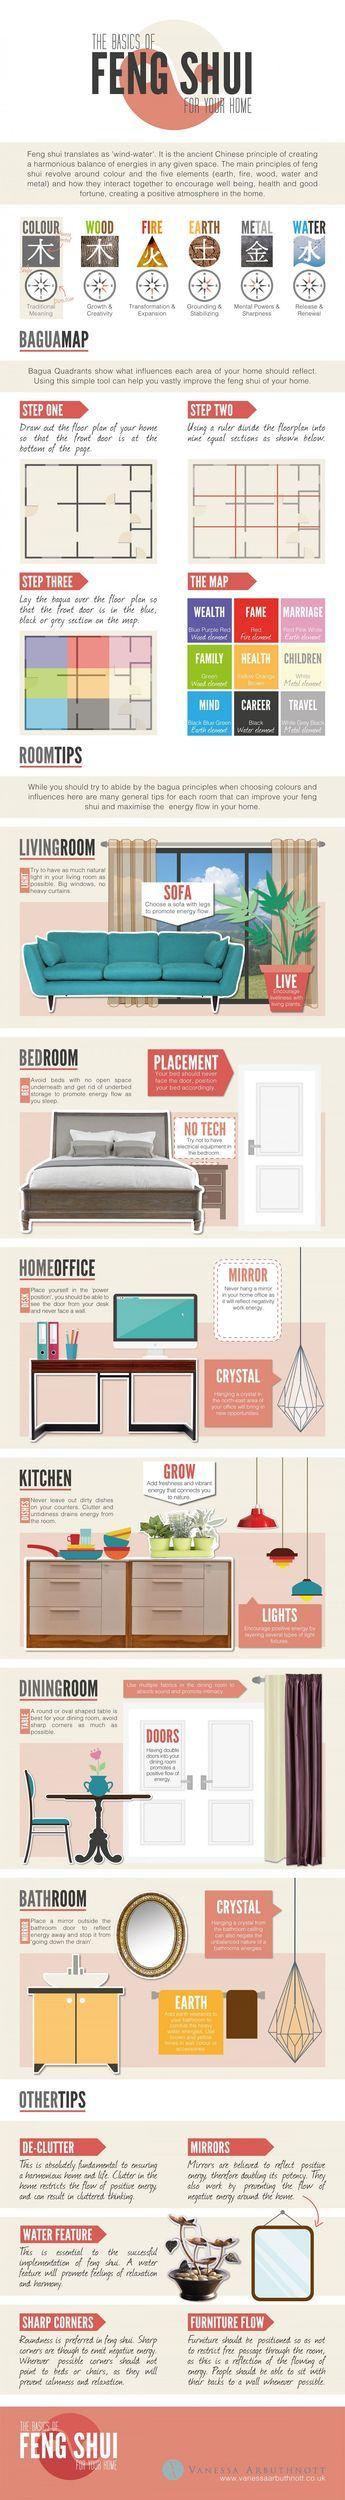 Master bedroom as per vastu shastra  Kathy IzonCarag izoncarag on Pinterest